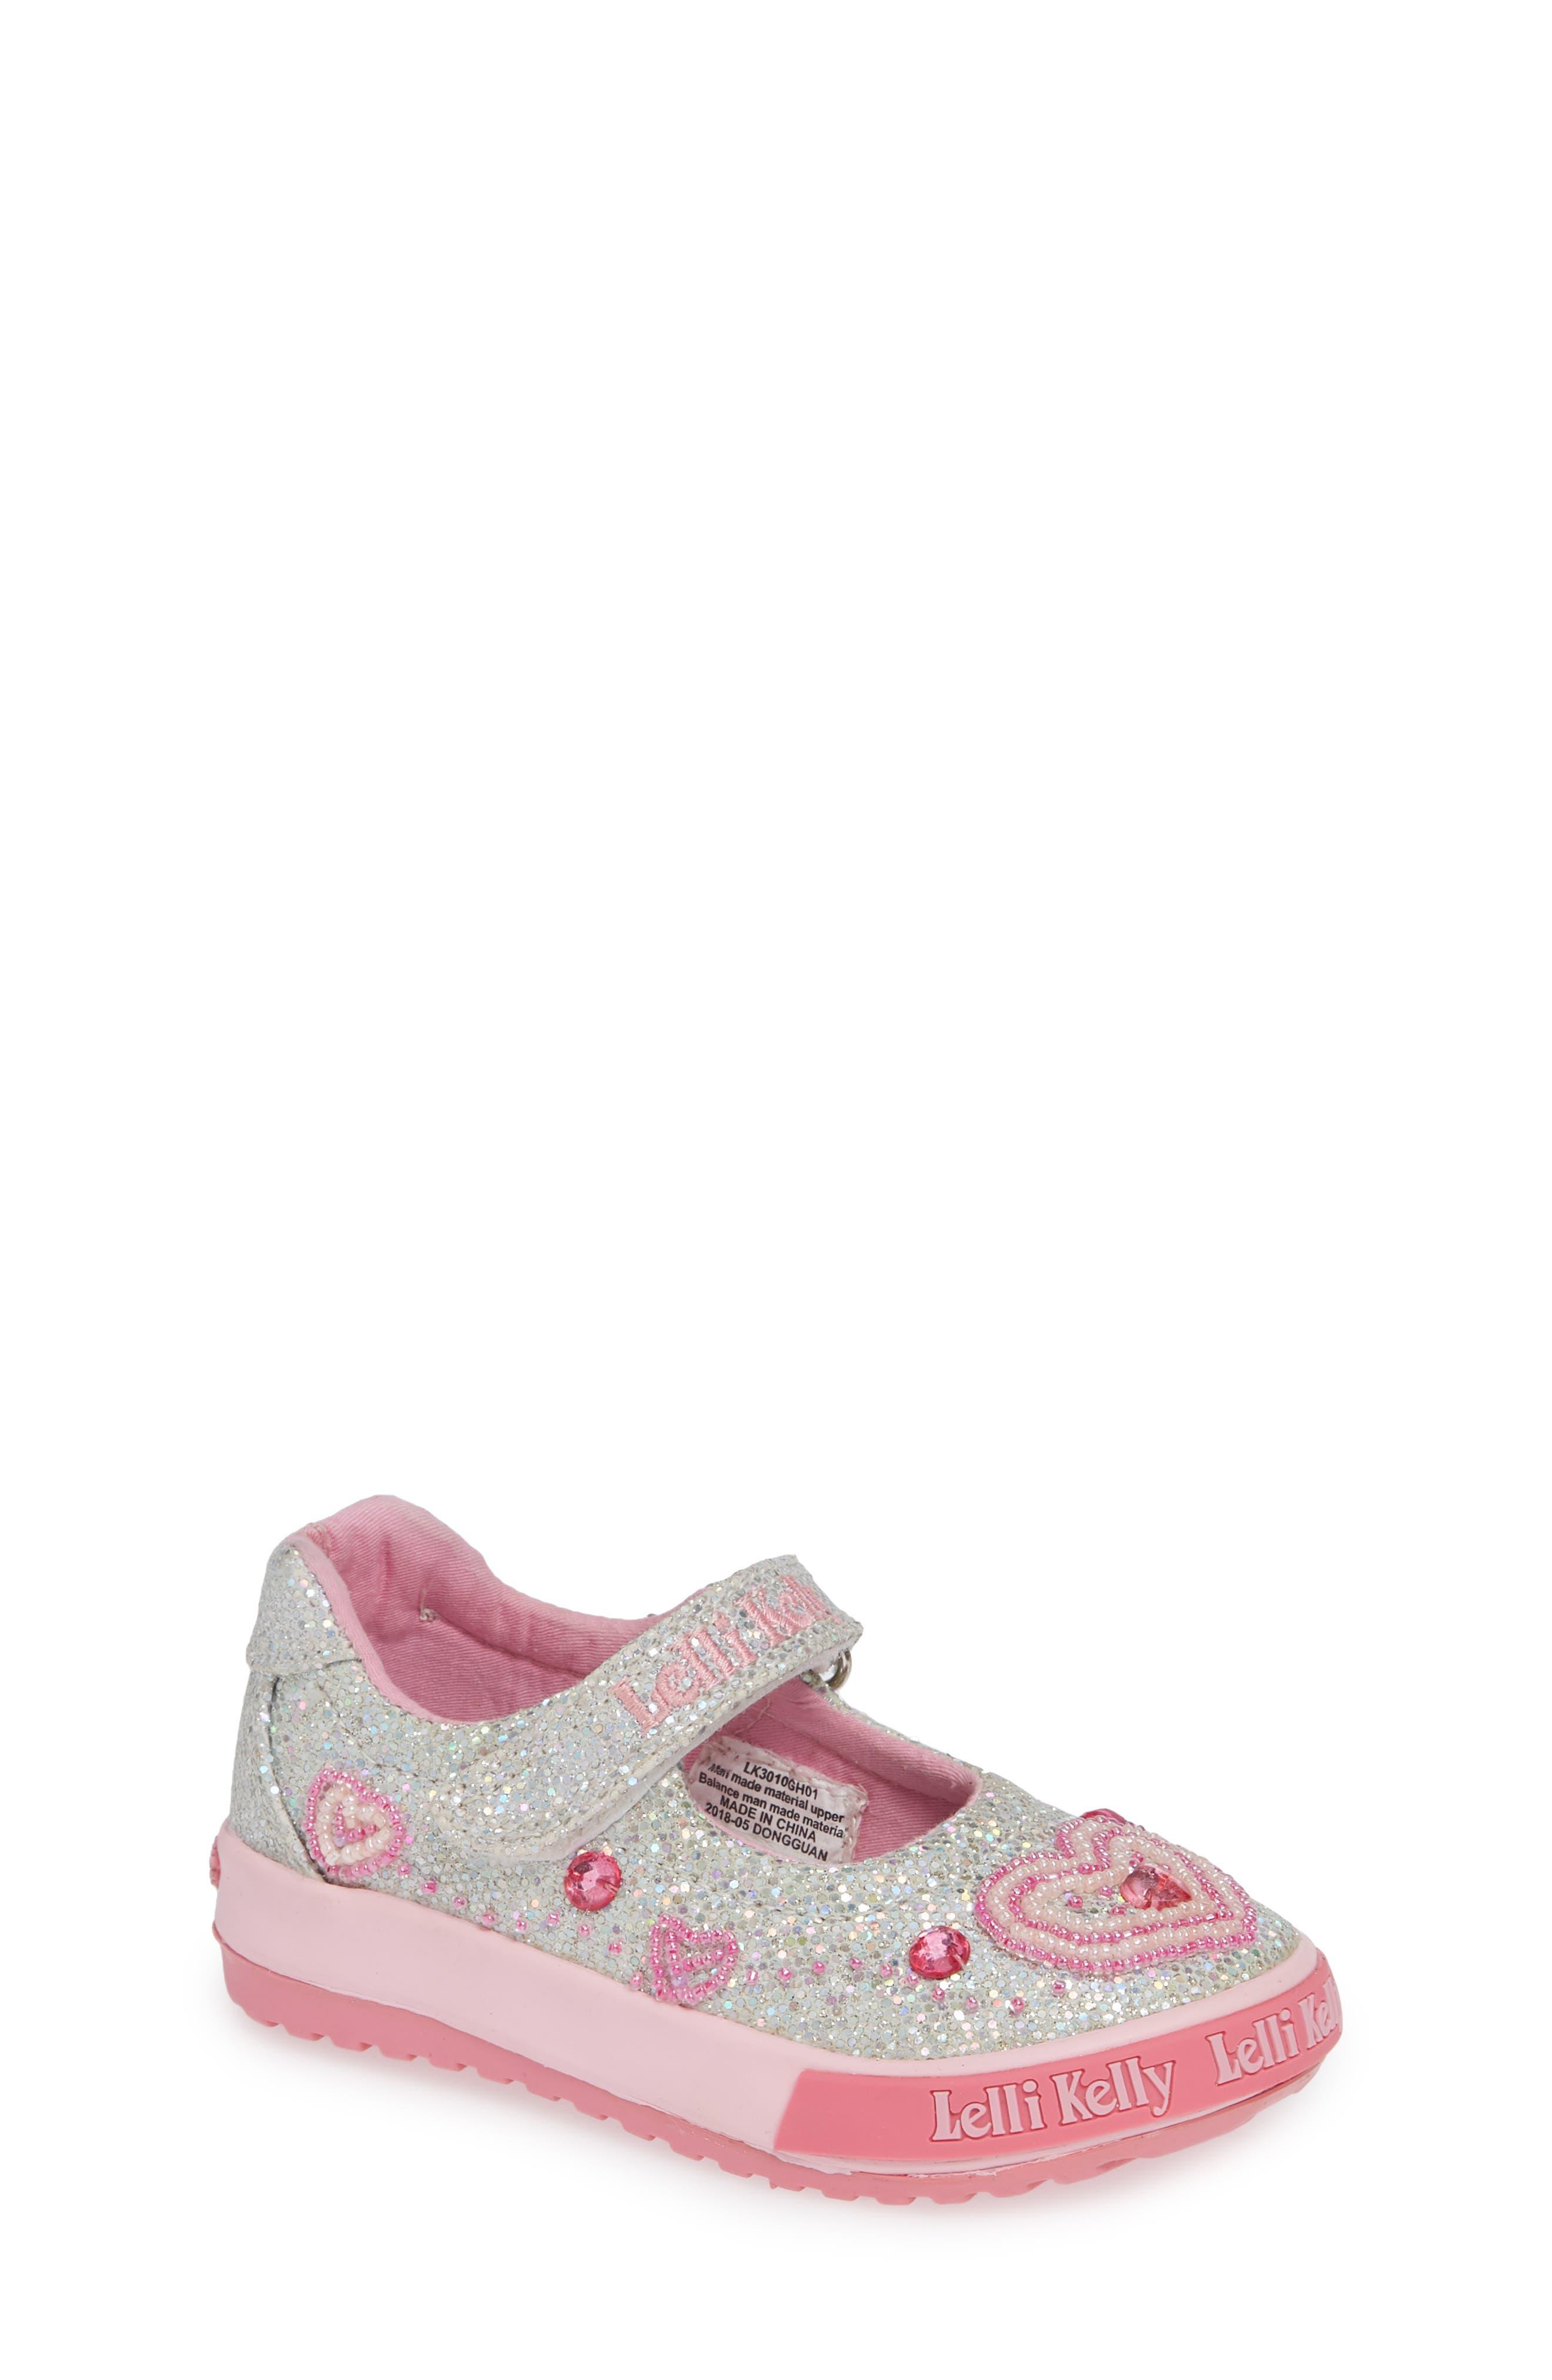 c700b98b4d4a3 Girls' Lelli Kelly Shoes | Nordstrom